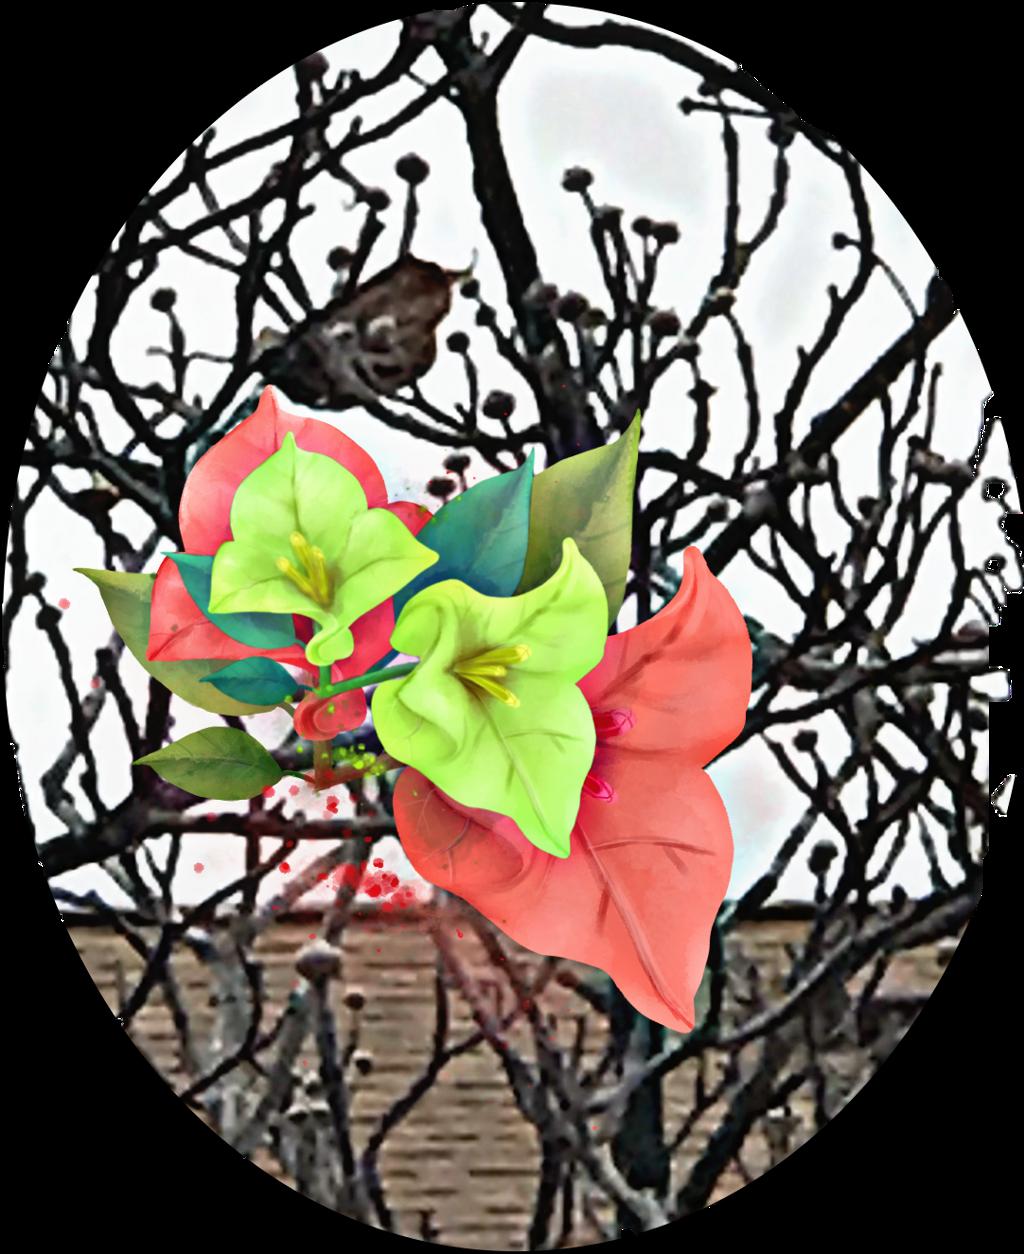 #freetoedit #tree #branches #bird #petsandanimals #flowers